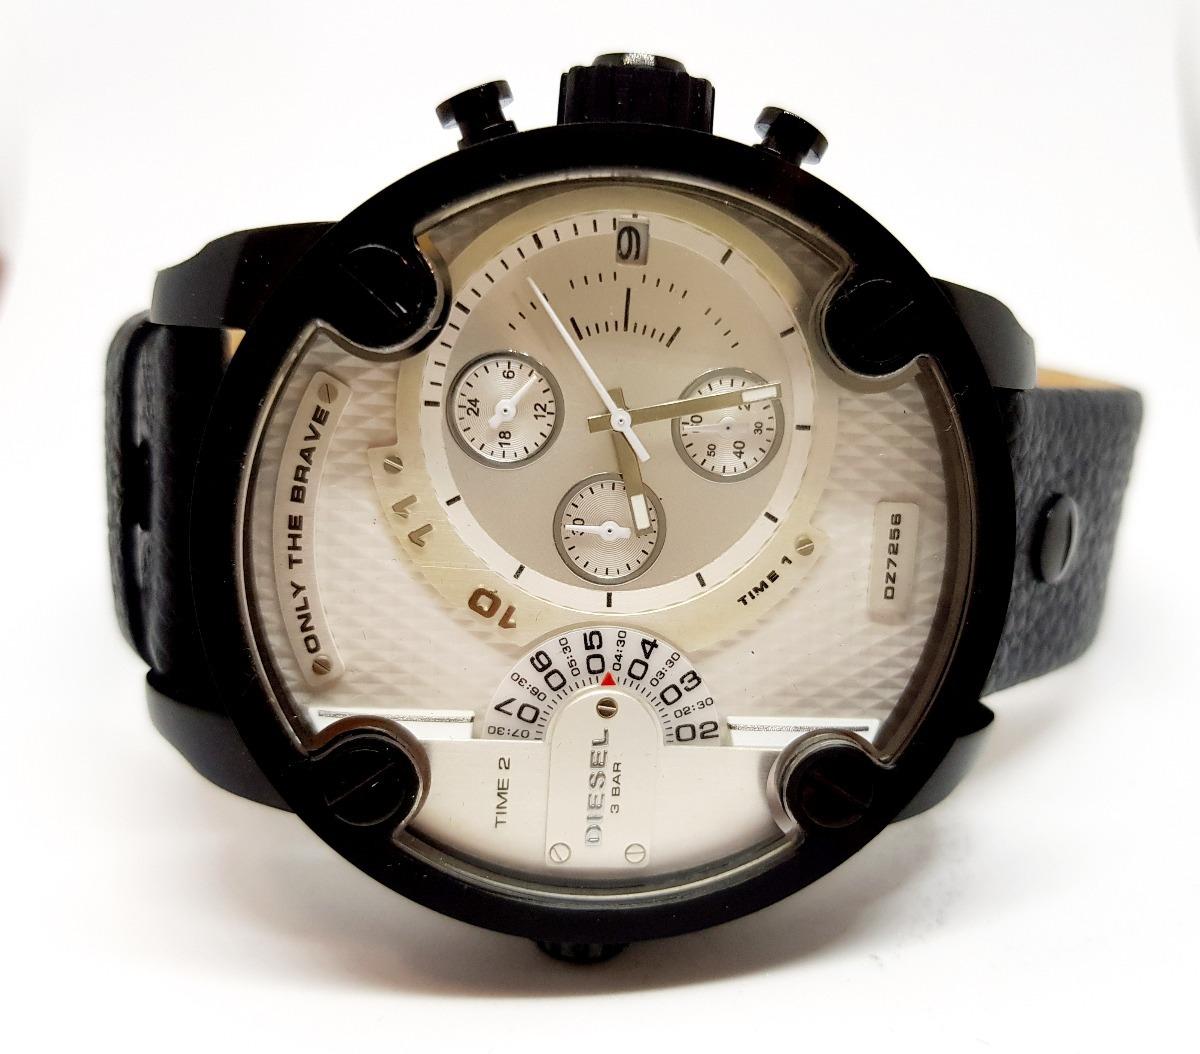 8c9d95251d39 relógio de pulso masculino diesel dz7256 fréte grátis. Carregando zoom.